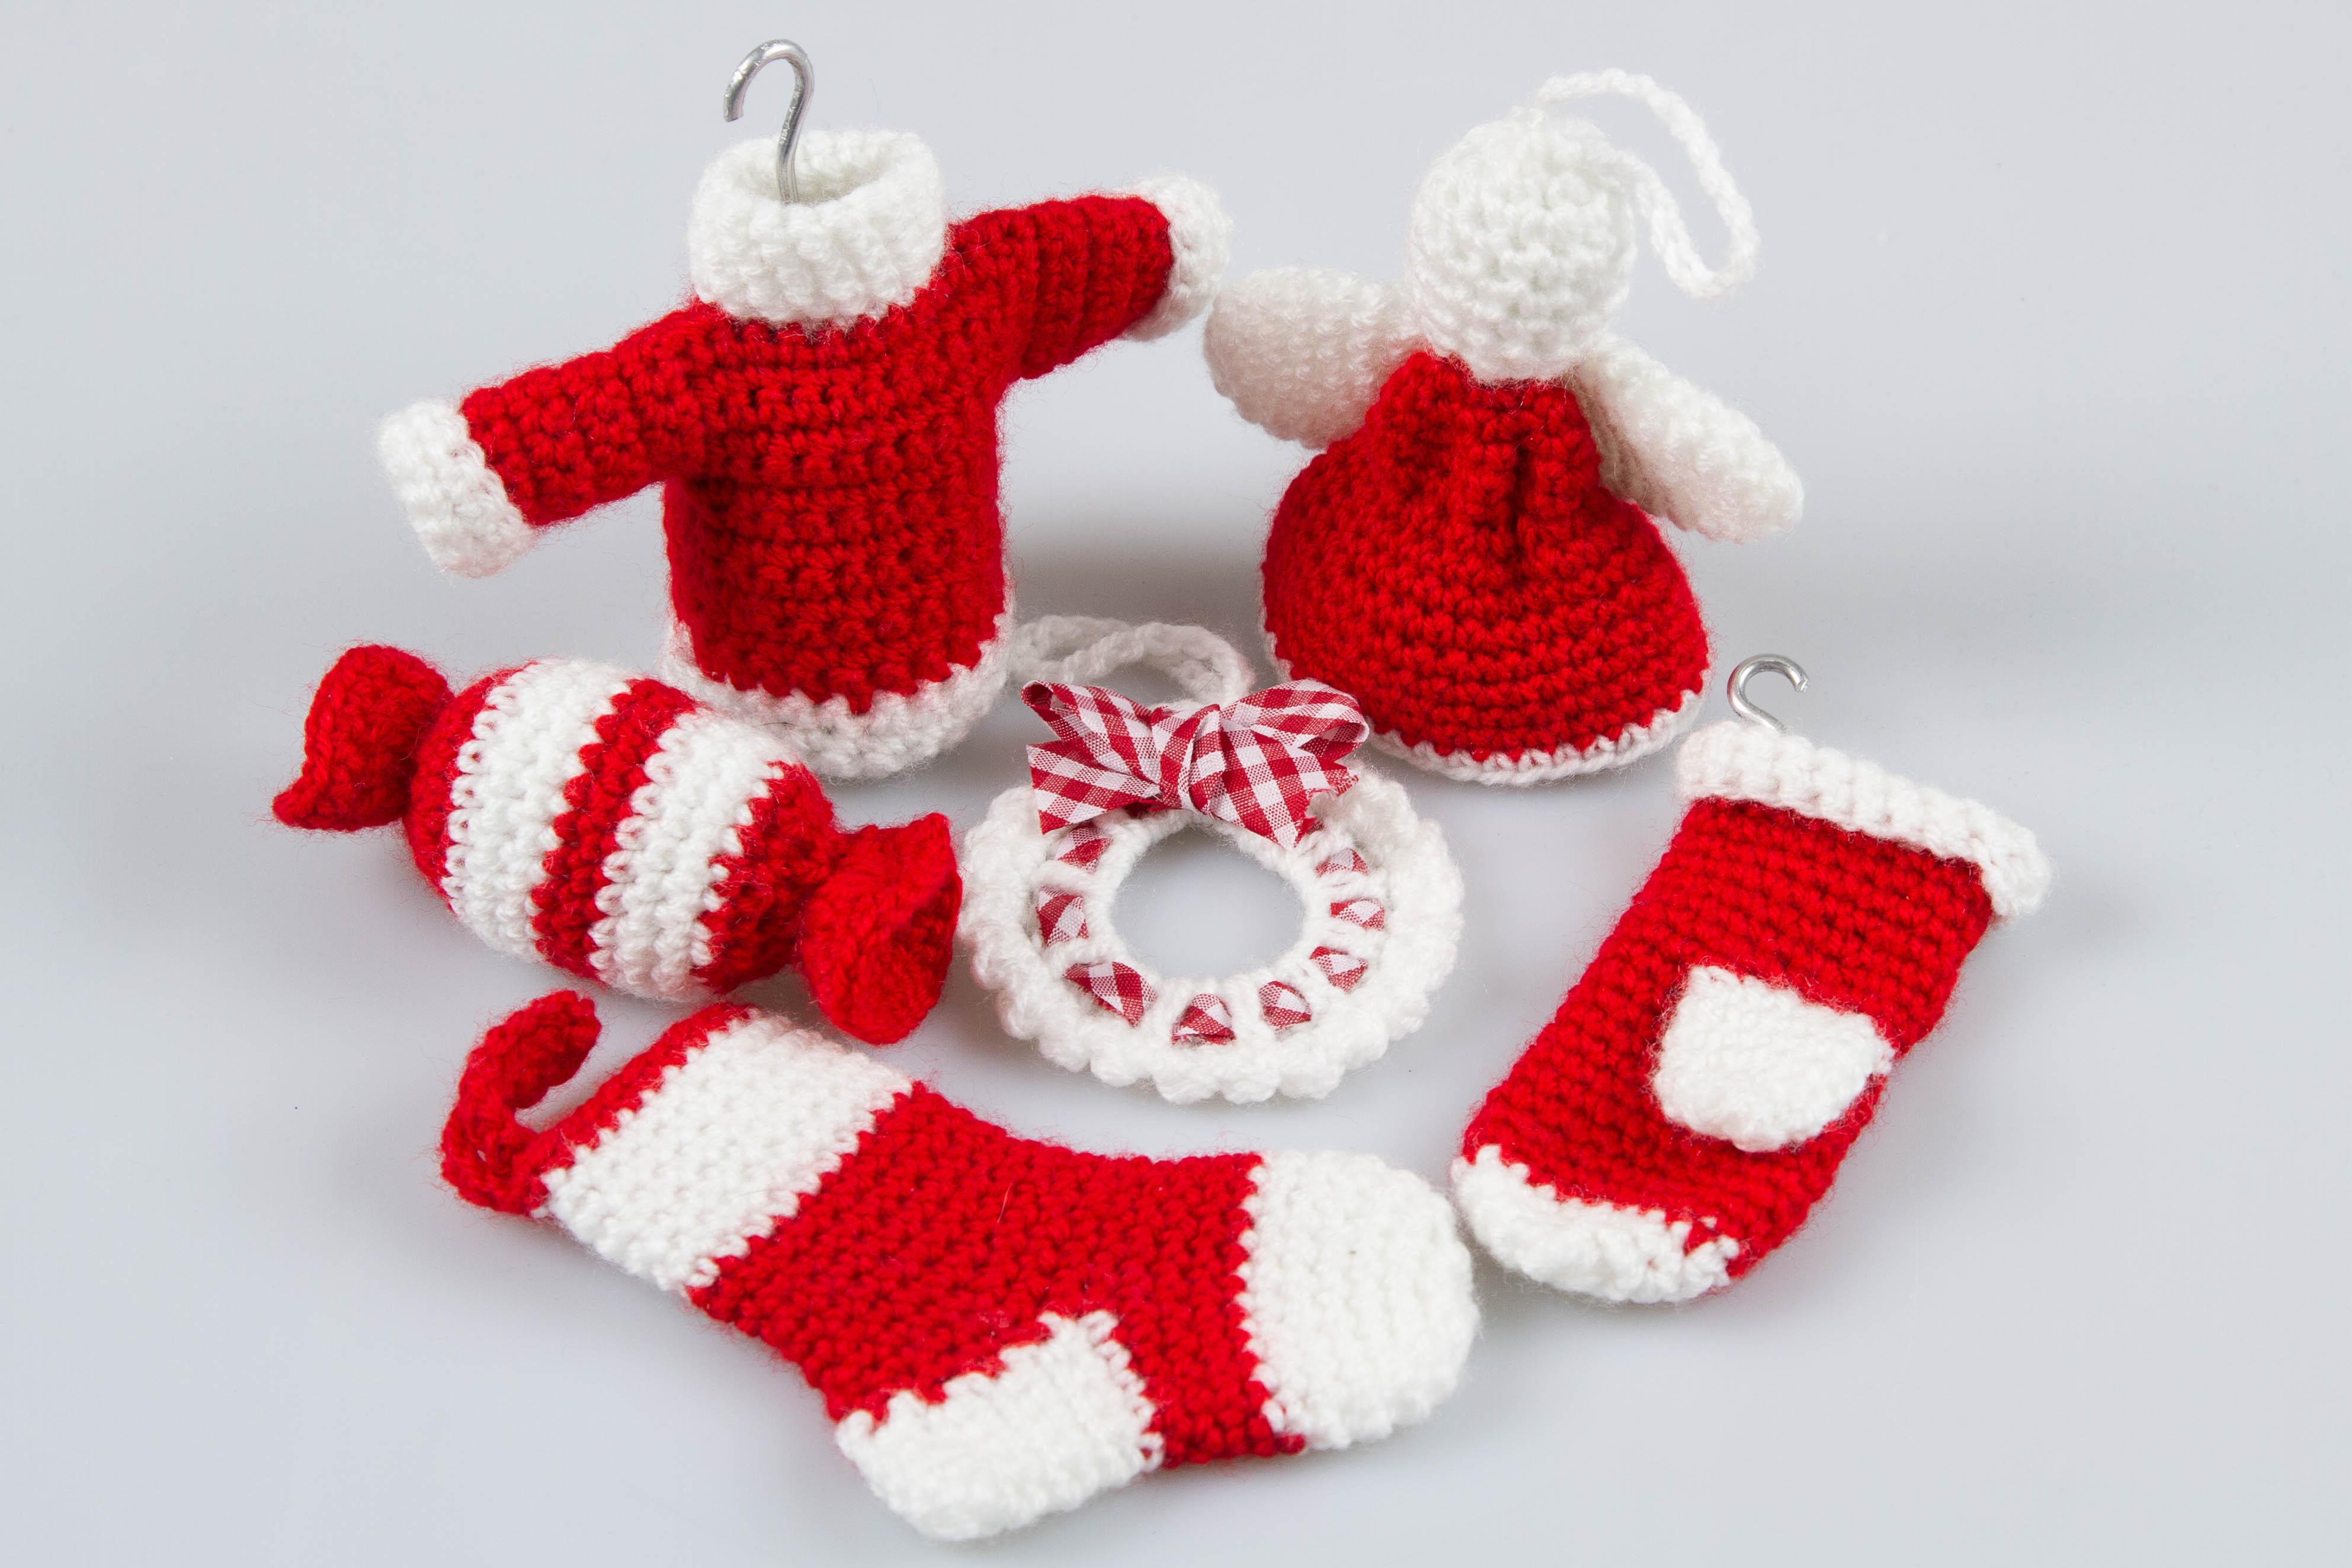 Wholesale Cotton Yarn Crochet Amigurumi Dolls Handmade Knitted ...   2647x3970